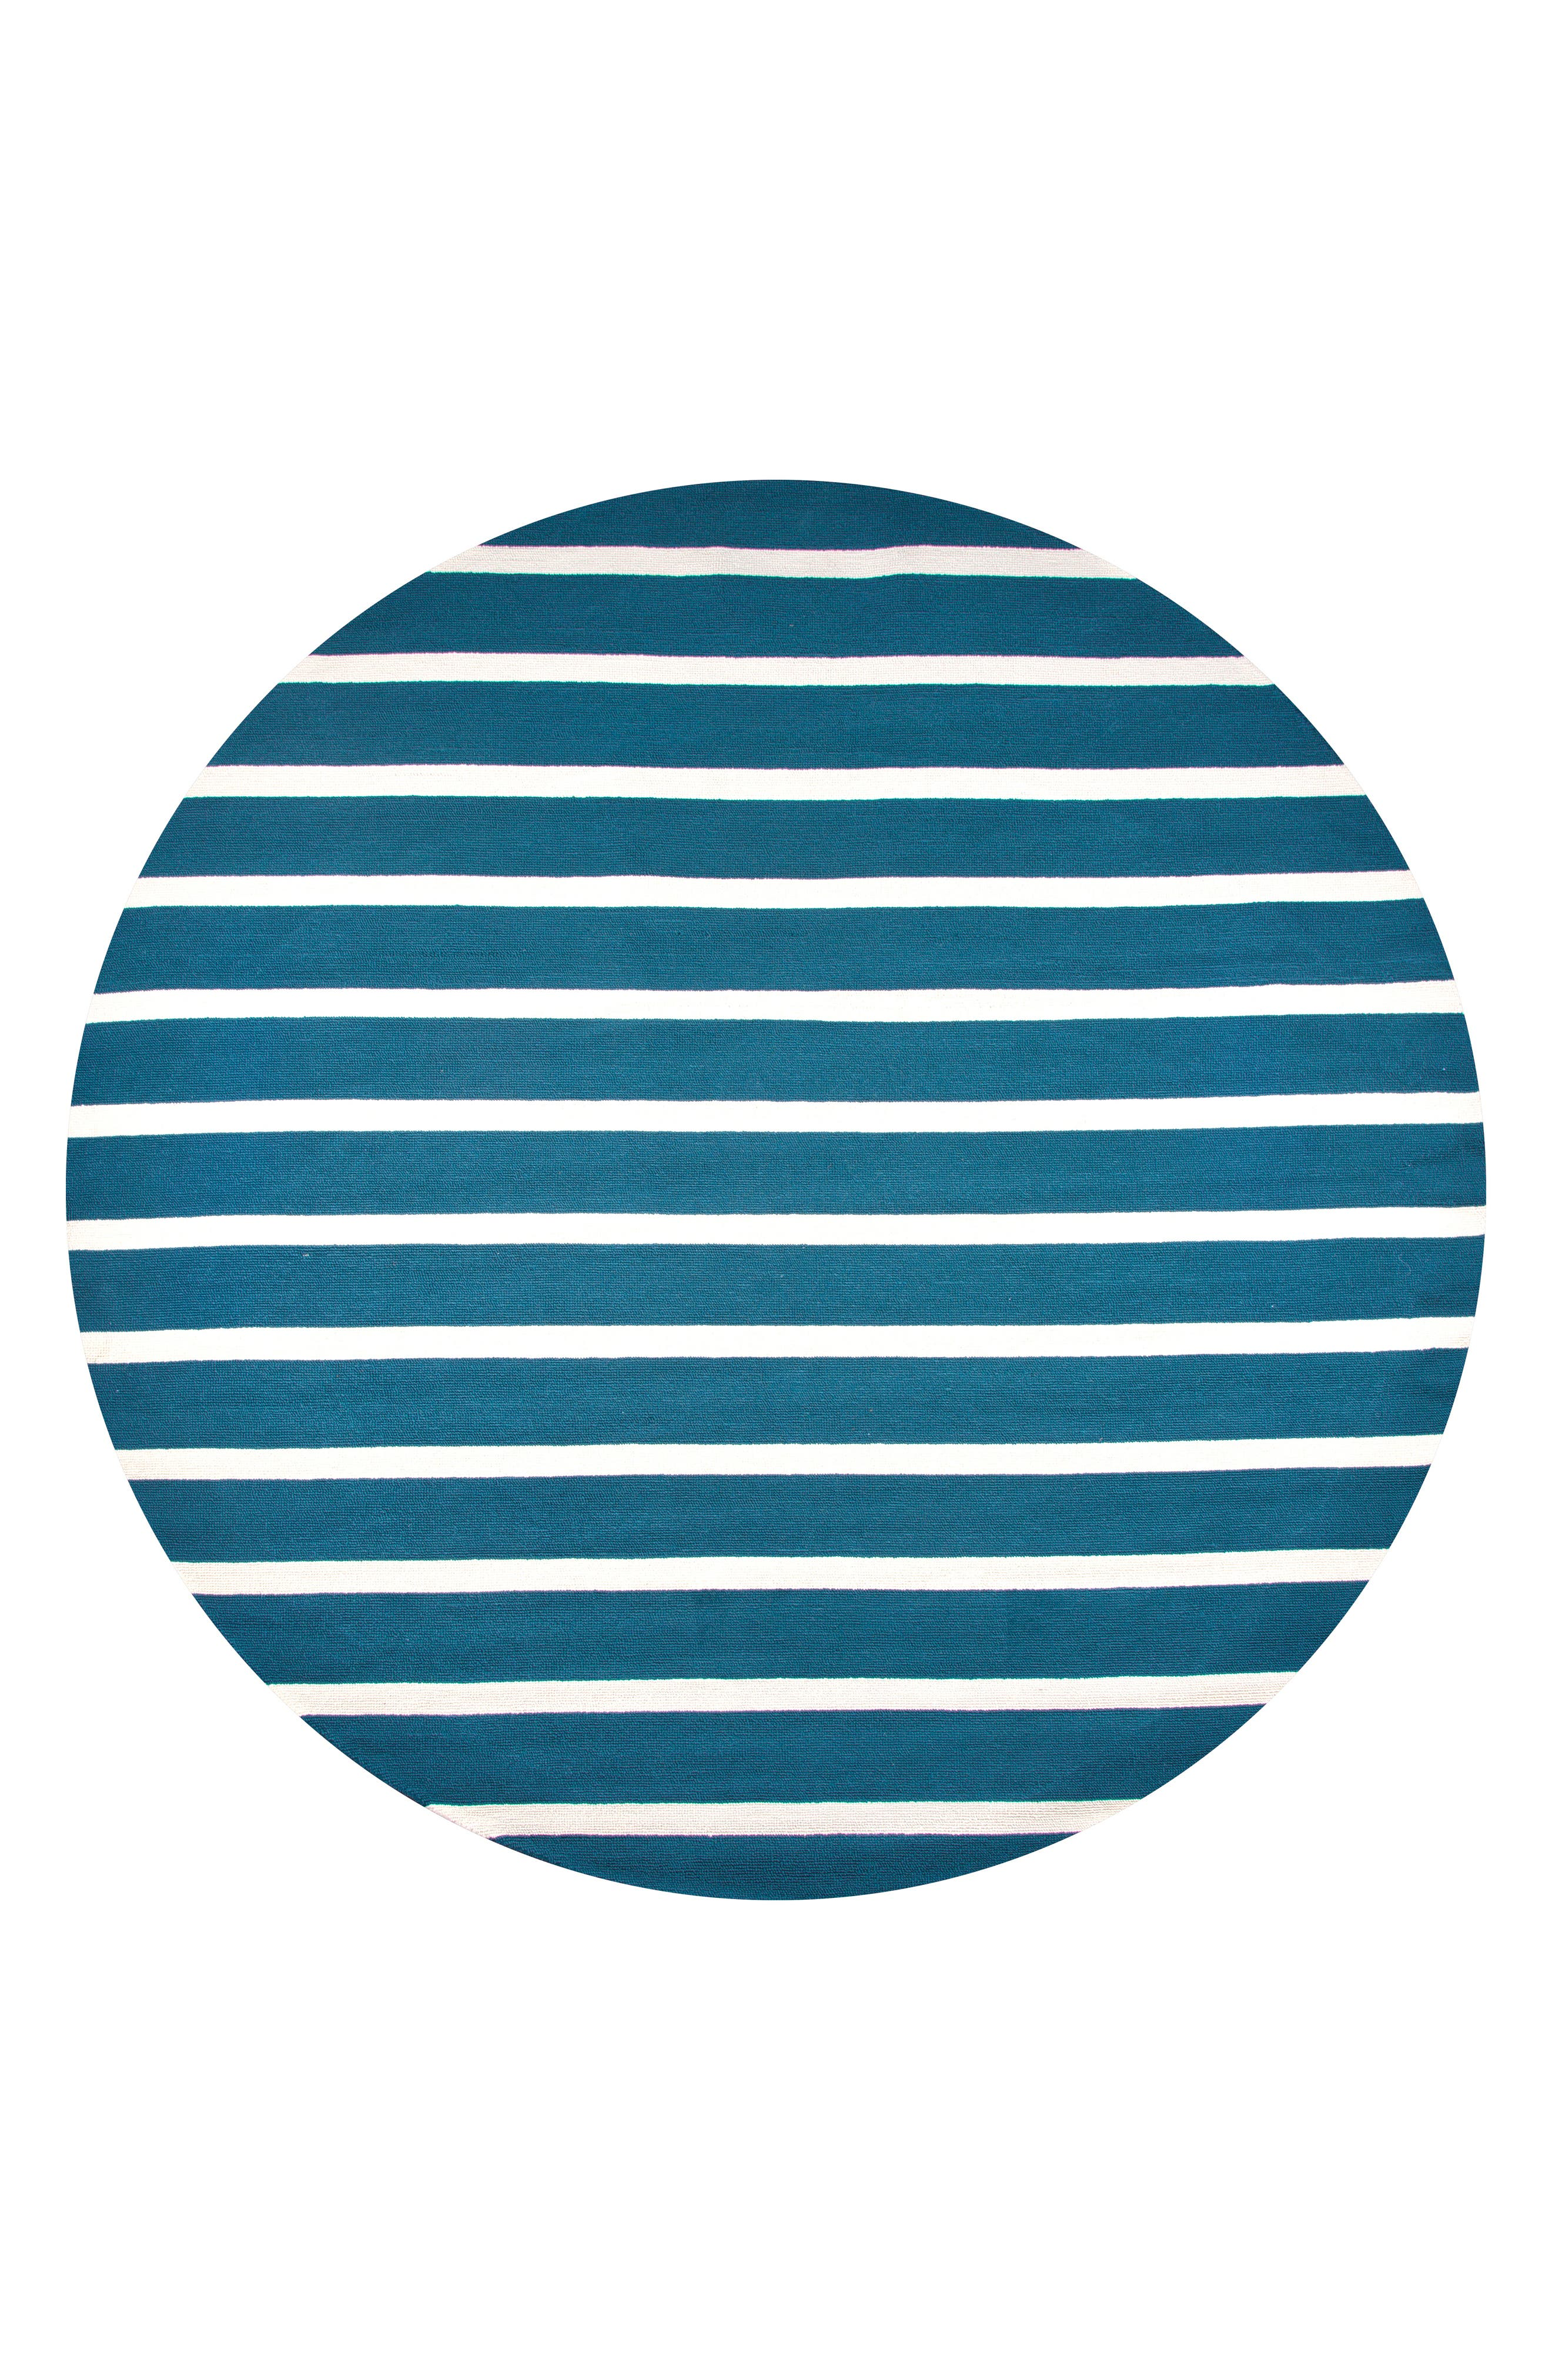 Azzura Hill Hana Rug,                             Alternate thumbnail 2, color,                             Marine Blue